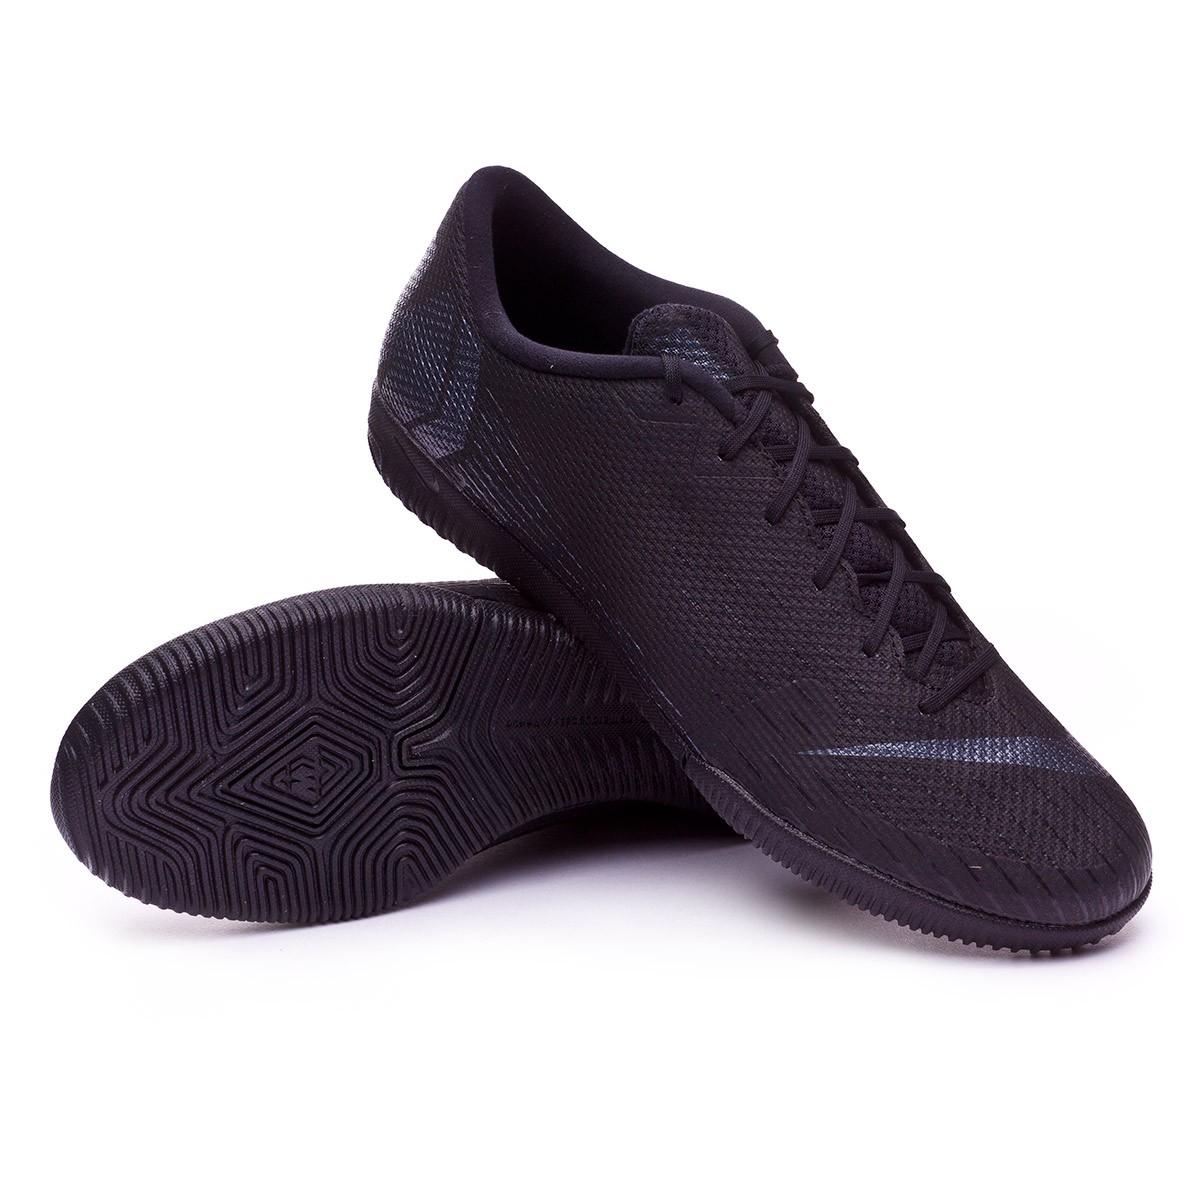 new arrival c12ae f8851 Chaussure de futsal Nike Mercurial Vapor XII Academy IC Black - Boutique de  football Fútbol Emotion